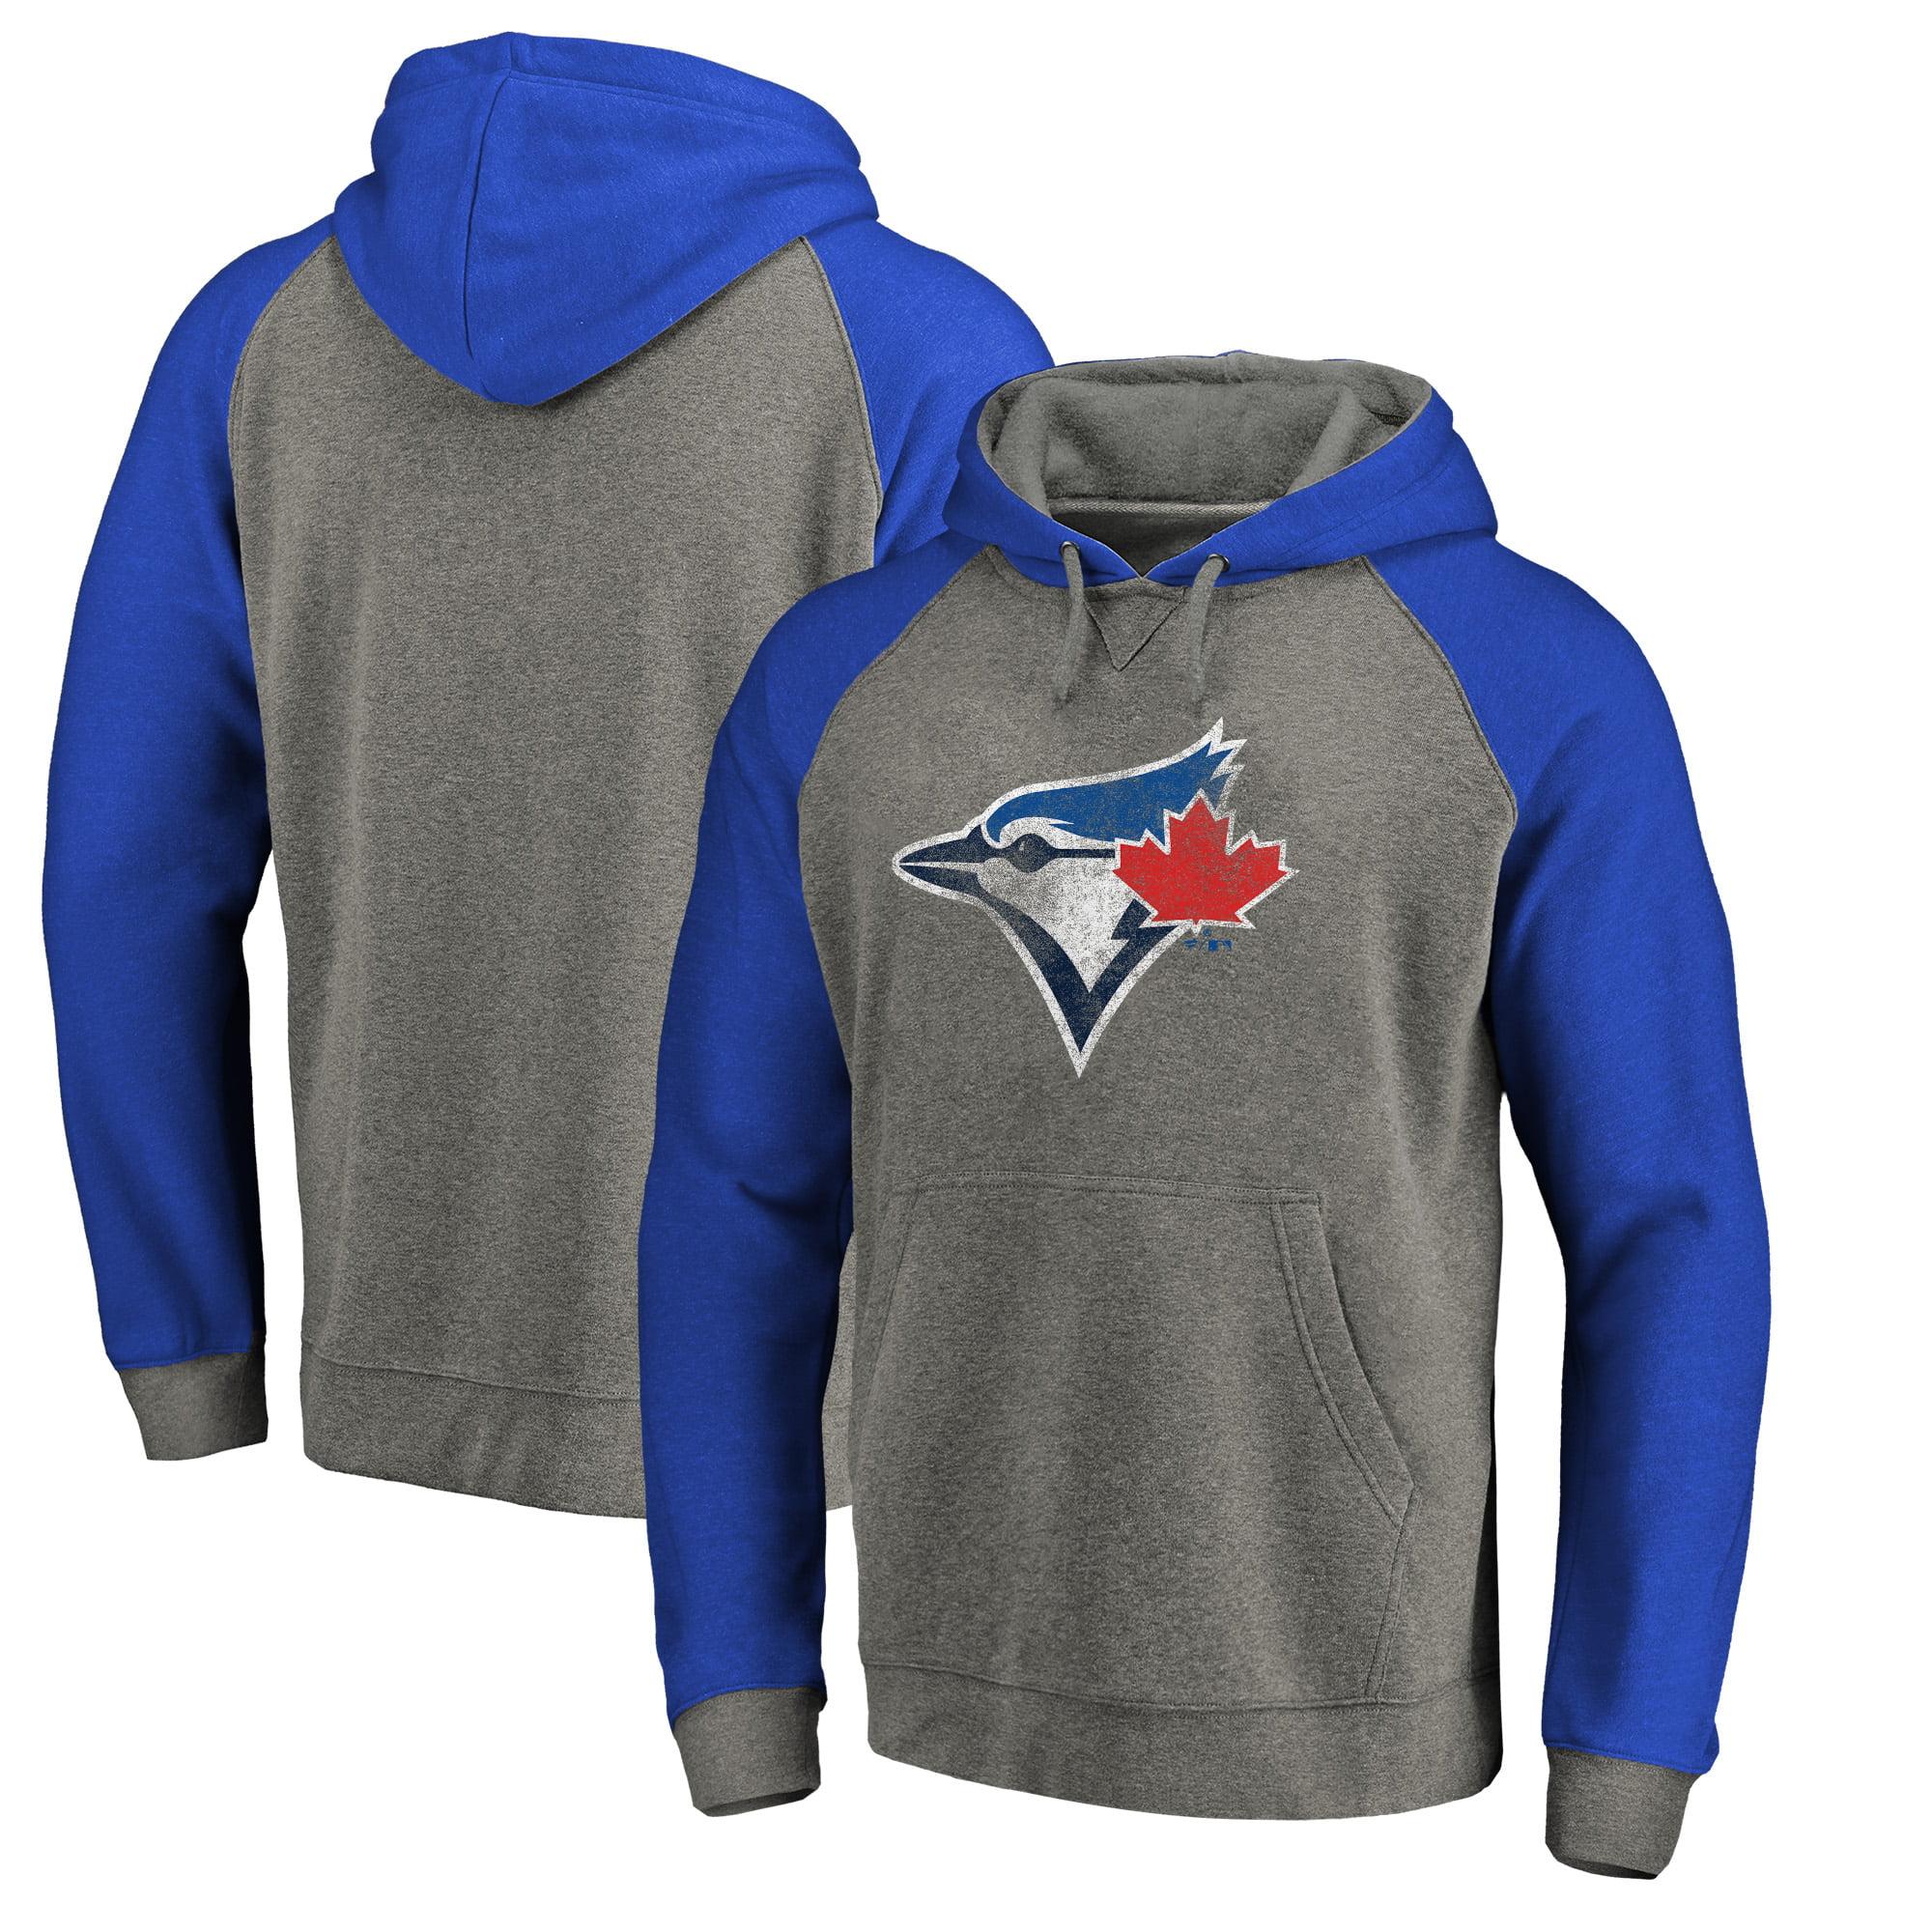 Toronto Blue Jays Fanatics Branded Distressed Team Logo Tri-Blend Raglan Pullover Hoodie - Gray/Royal